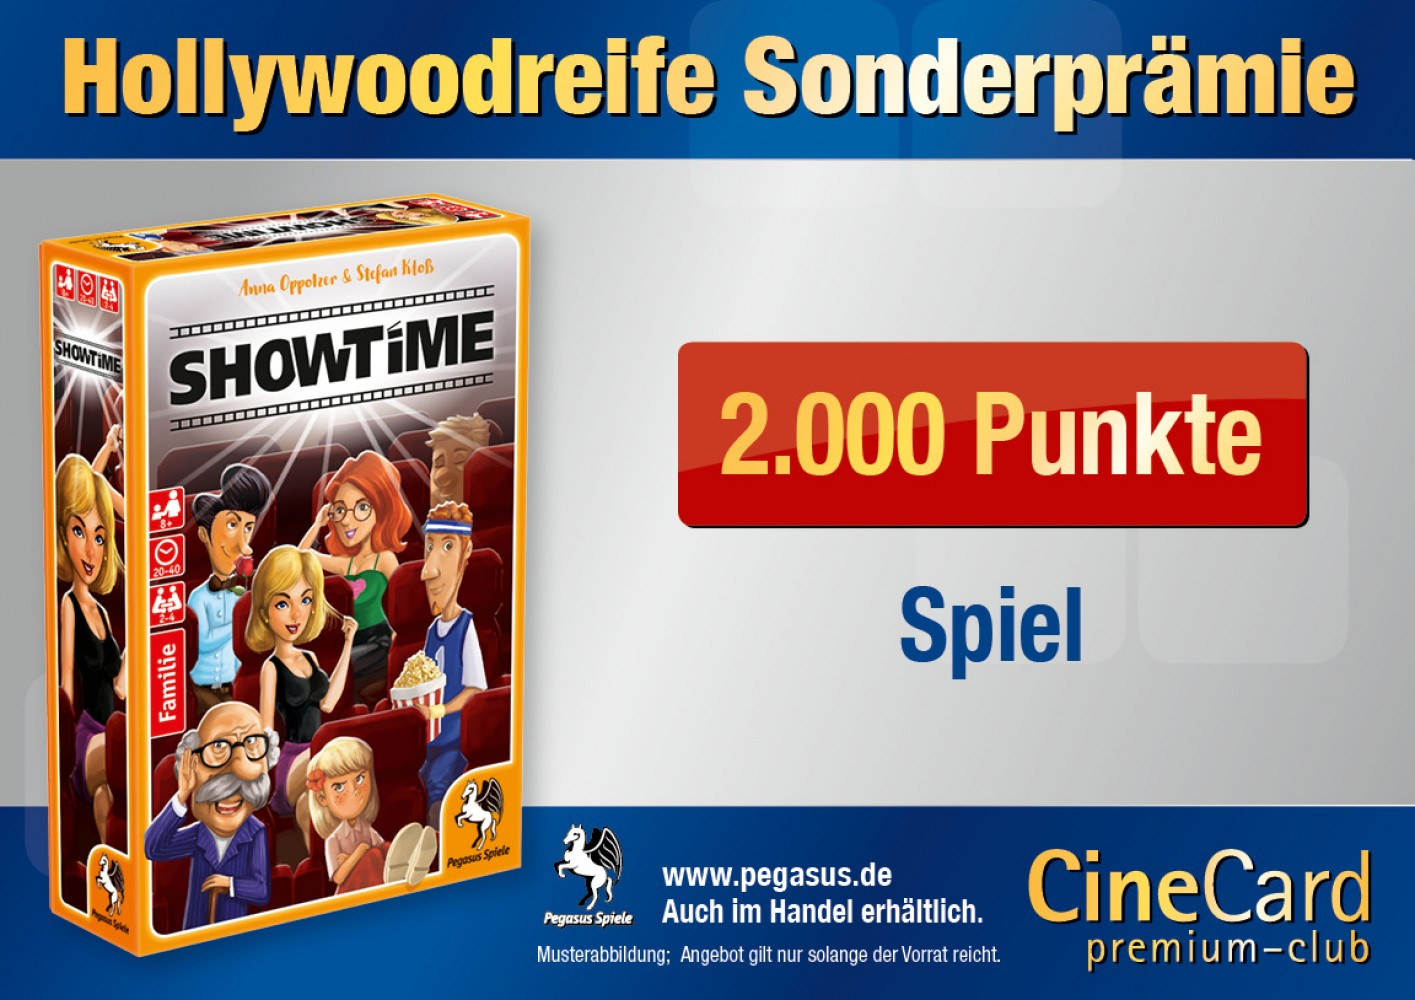 CineCard Bonussystem – Prämien und Privilegien – KINOPOLIS Main-Taunus